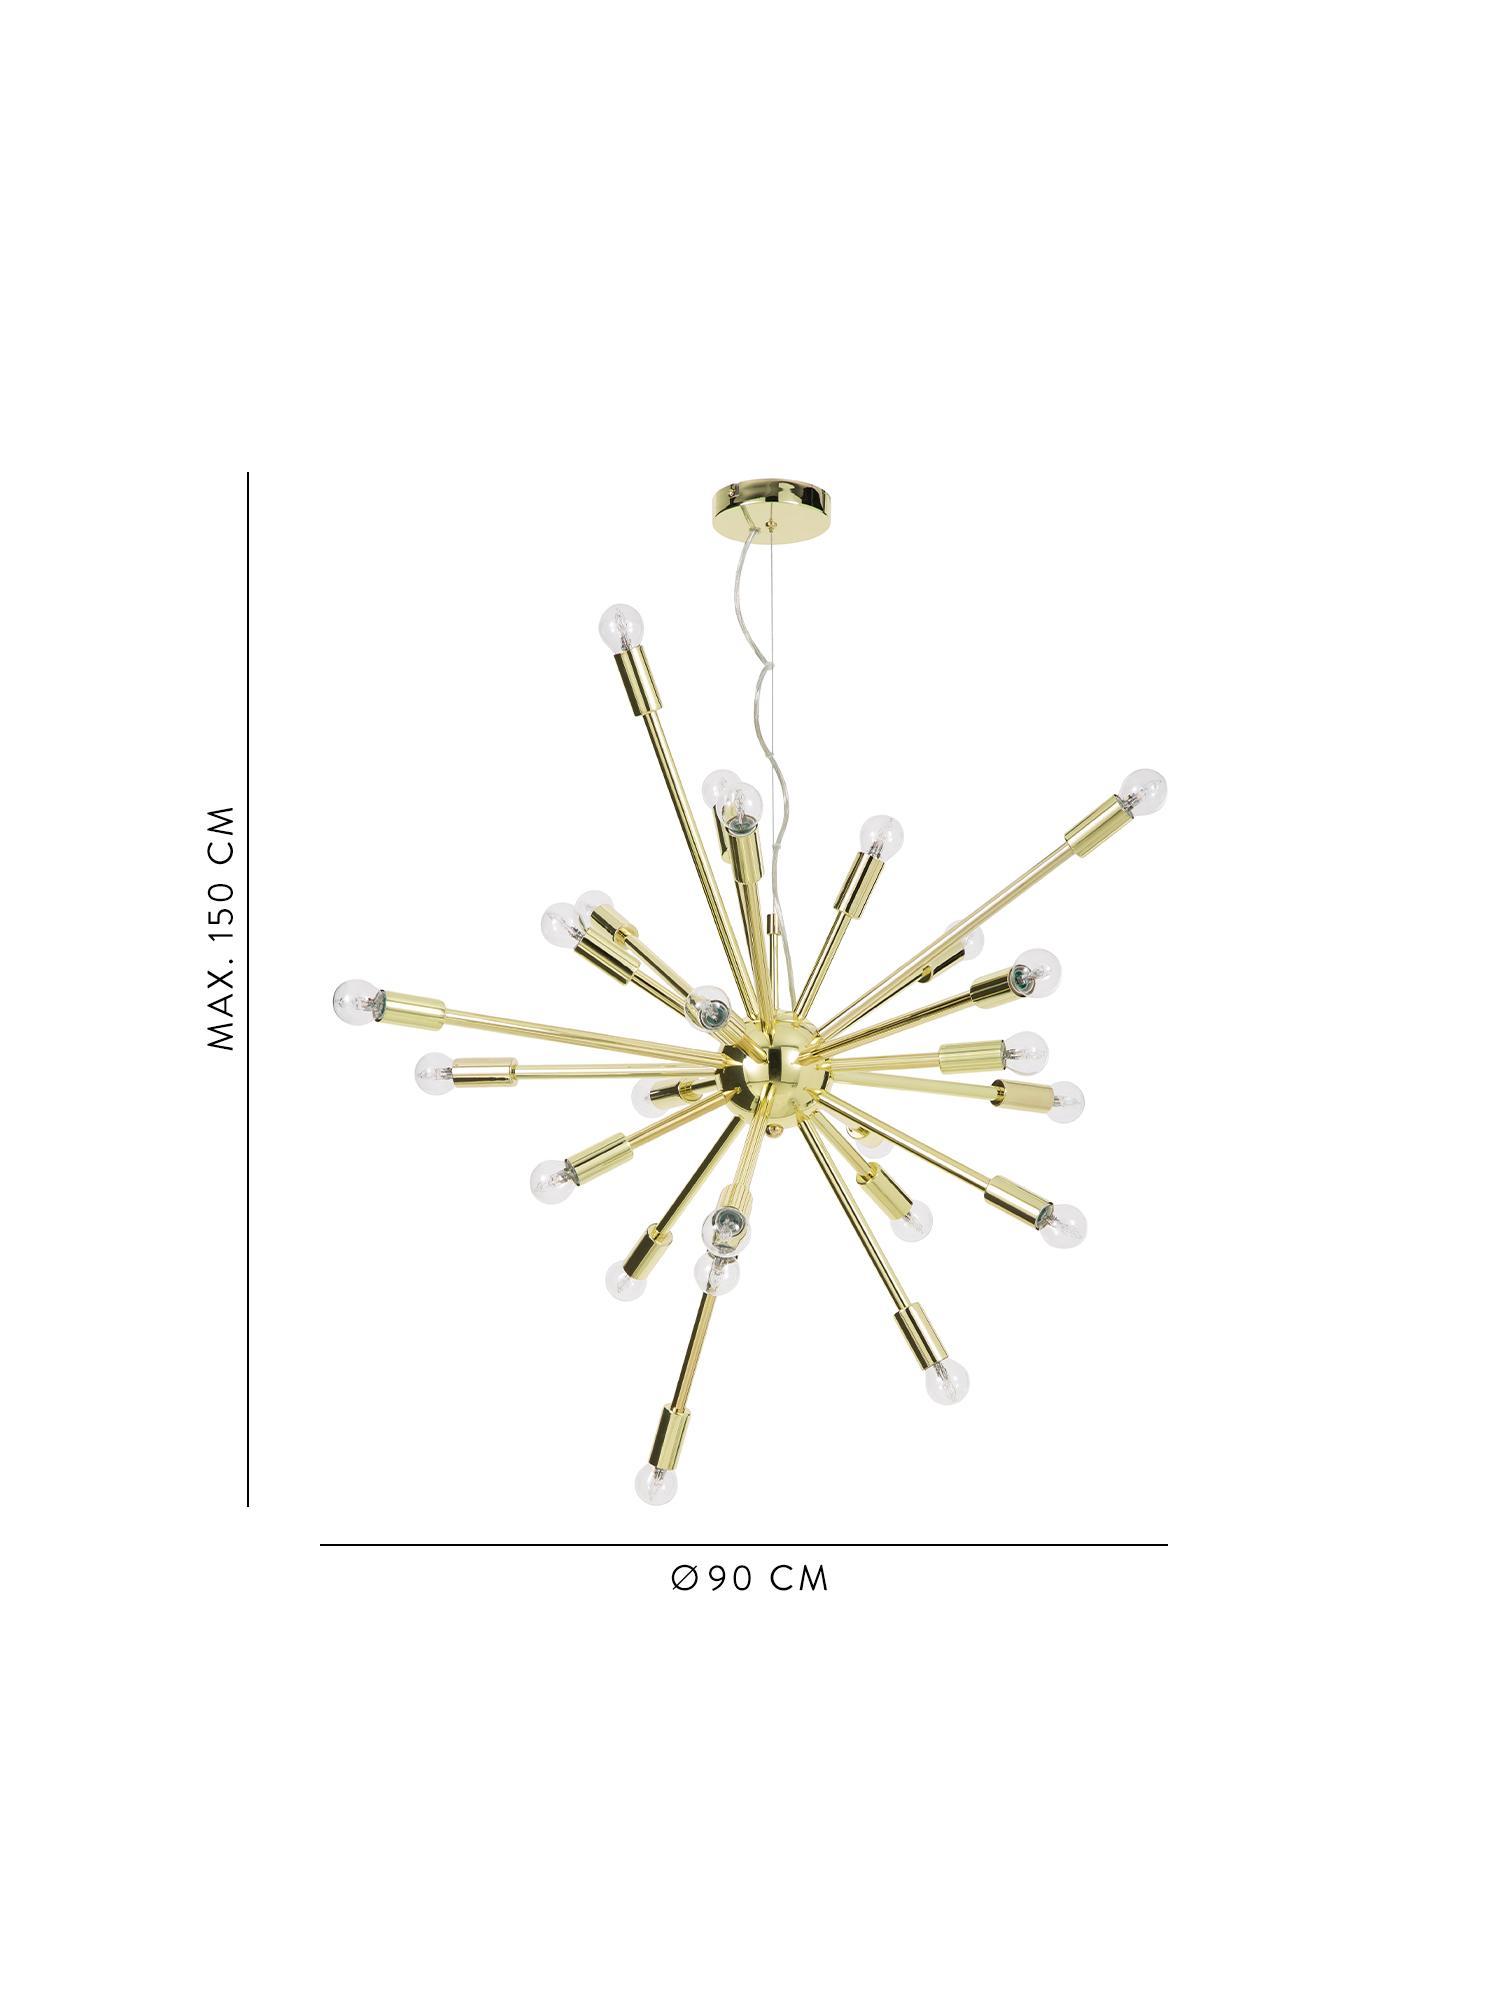 Grande suspension dorée Spike, Couleur dorée